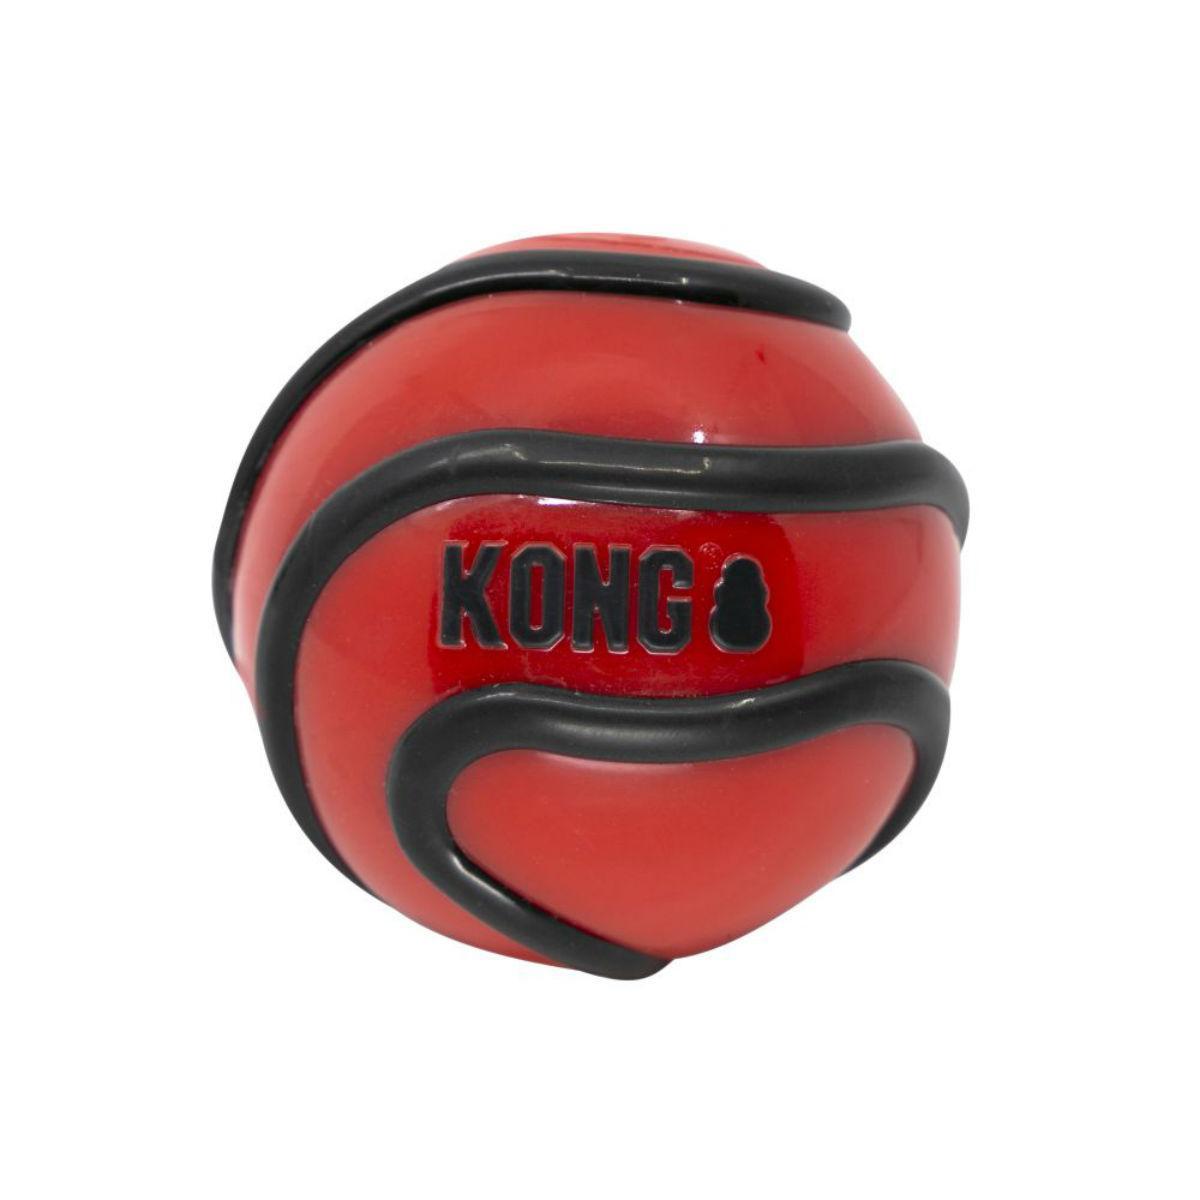 KONG Wavz Ball Dog Toy